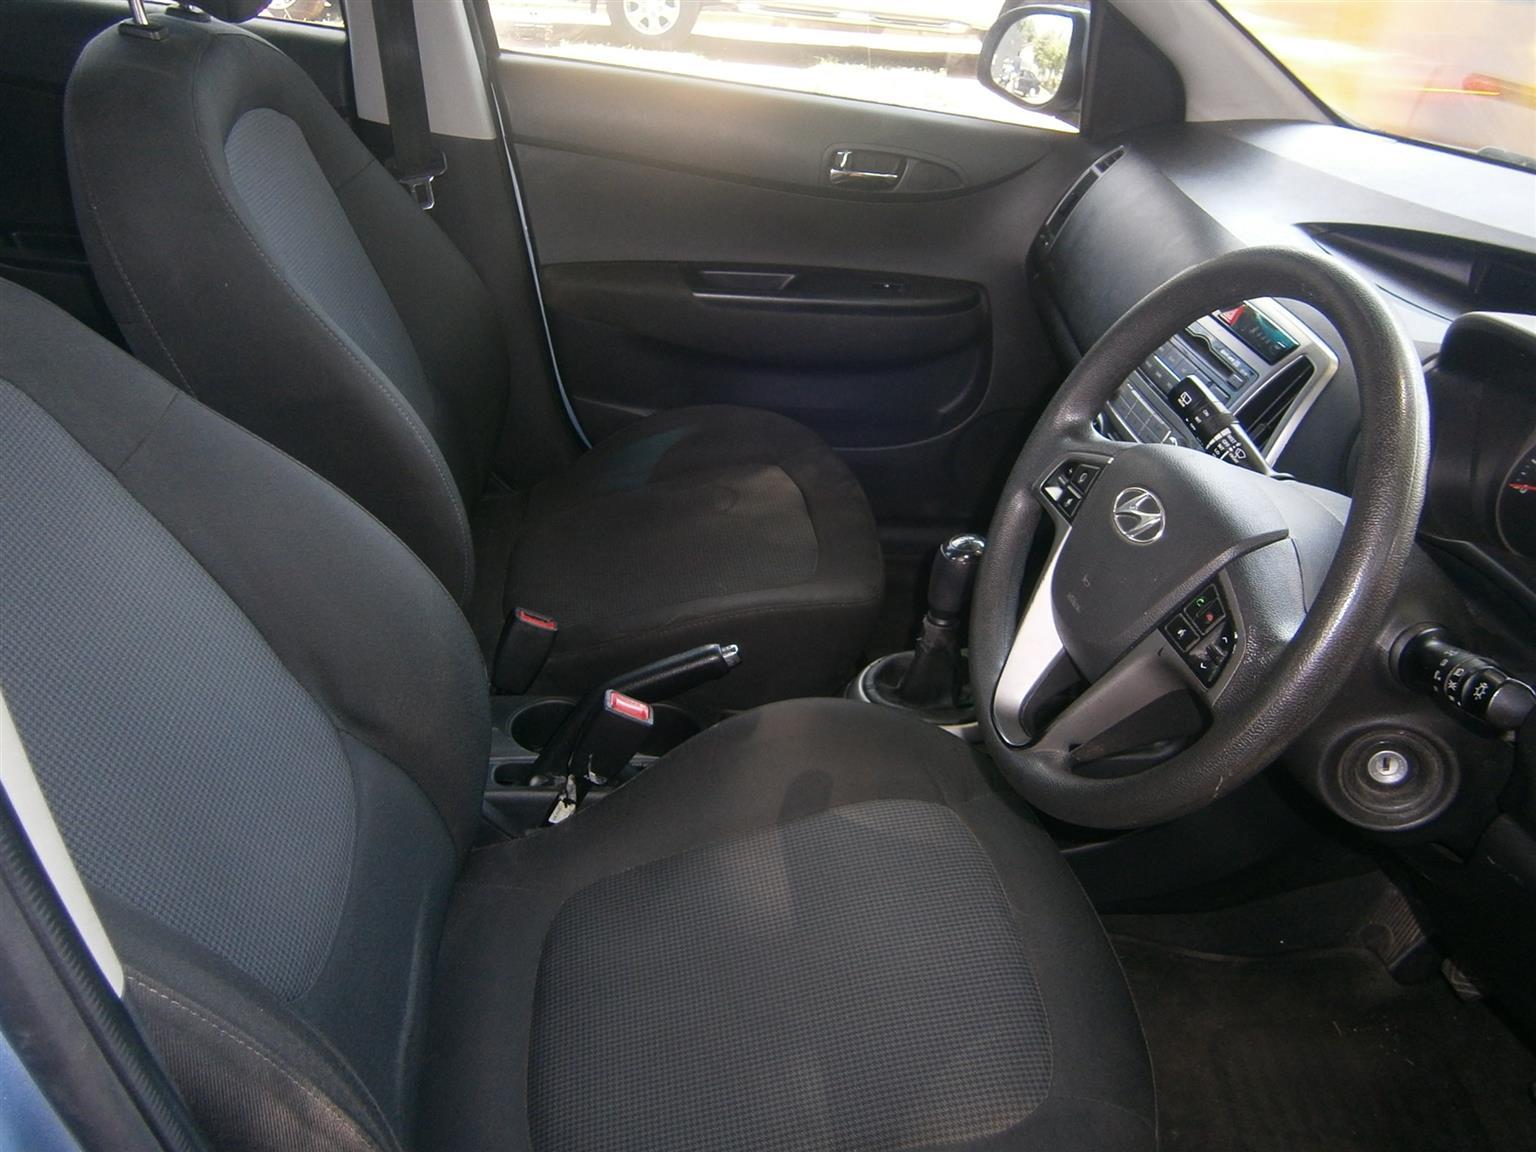 2013 Hyundai i20 1.4 Fluid auto